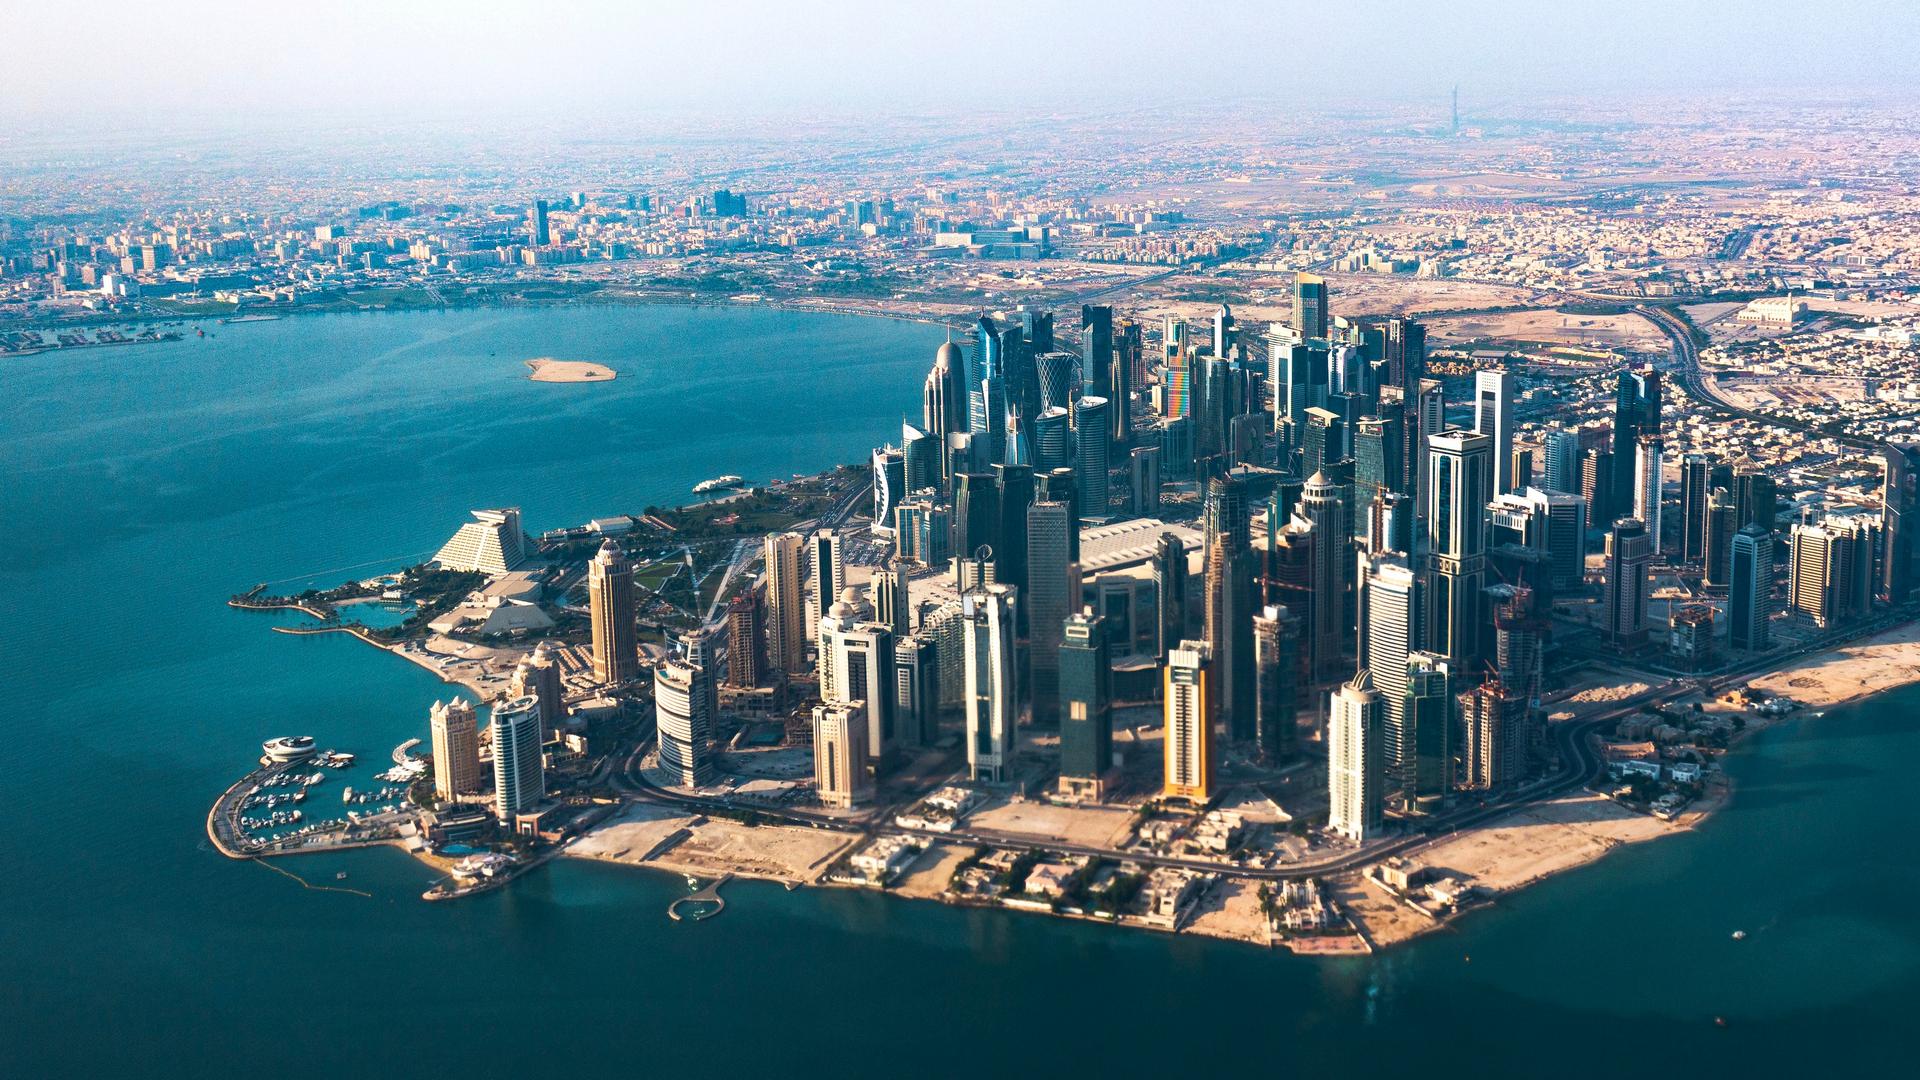 A view in Qatar